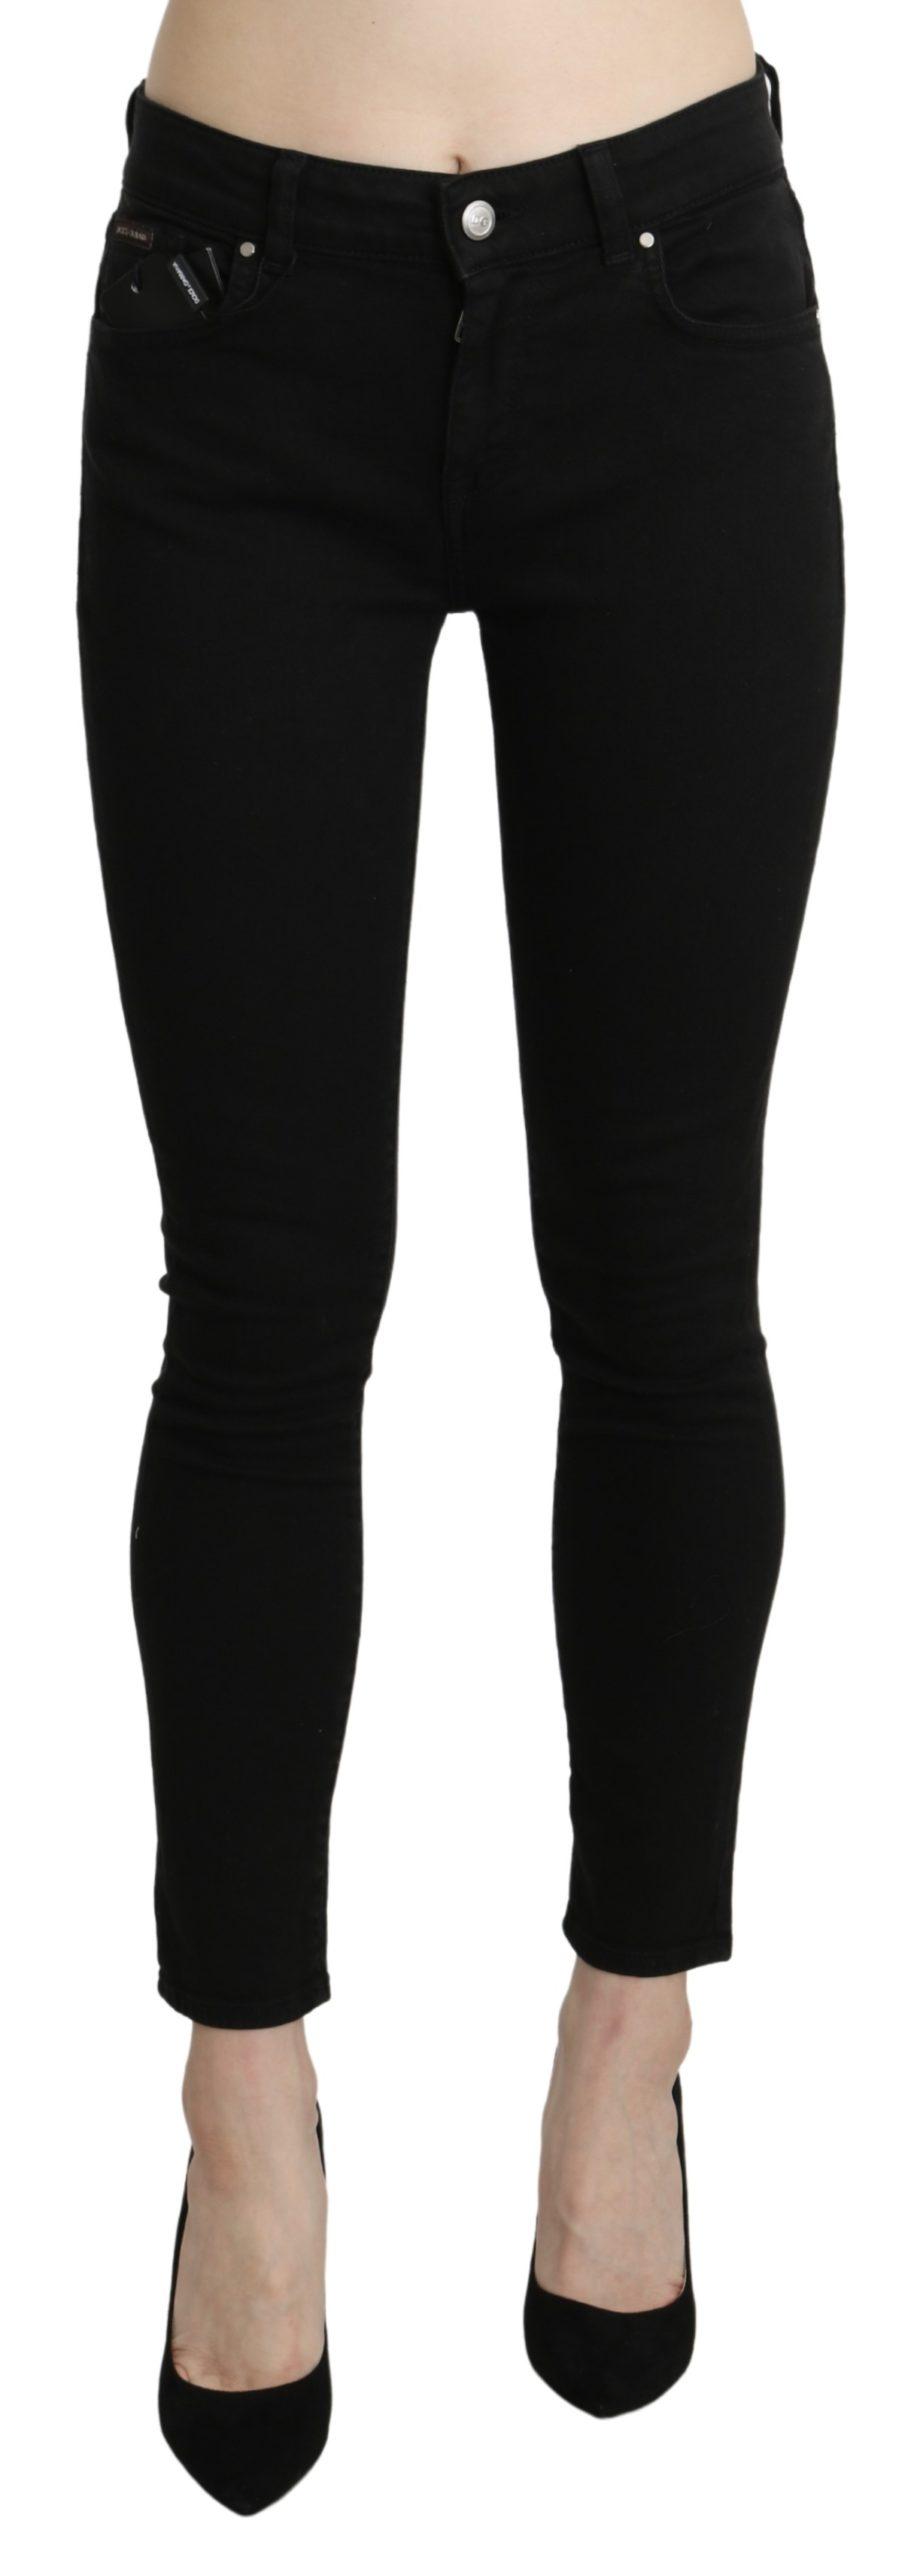 Black Skinny Cotton Stretch Jeans - IT40 S